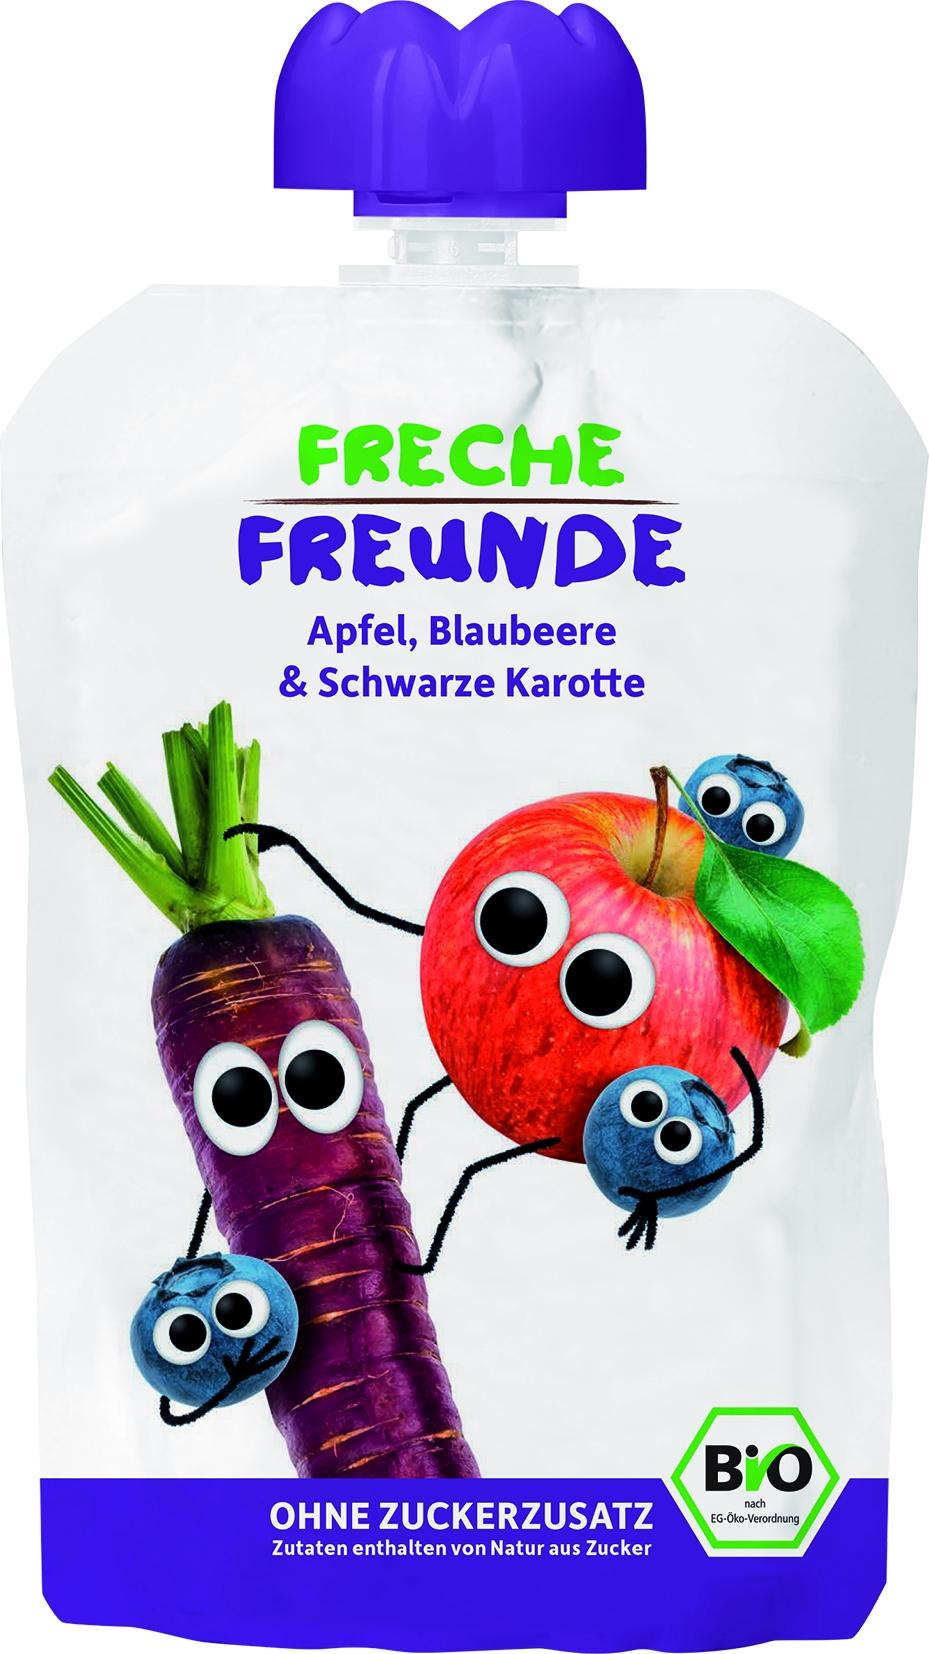 Freche Freunde - Apfel / Blaubeere / Schwarze Karotte